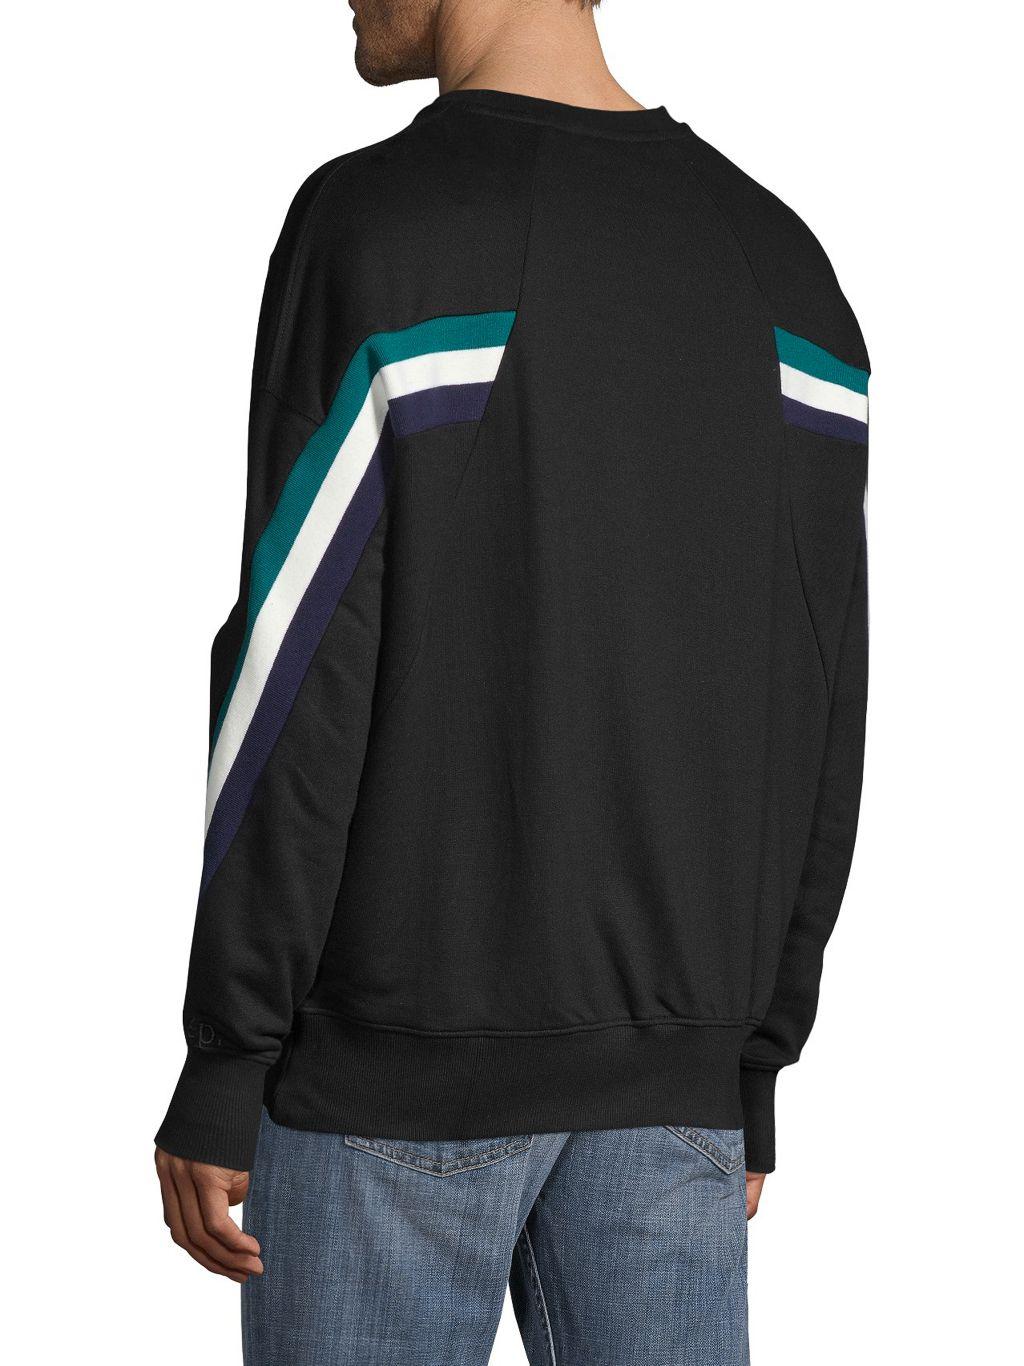 Eleven Paris Crewneck Cotton Sweatshirt